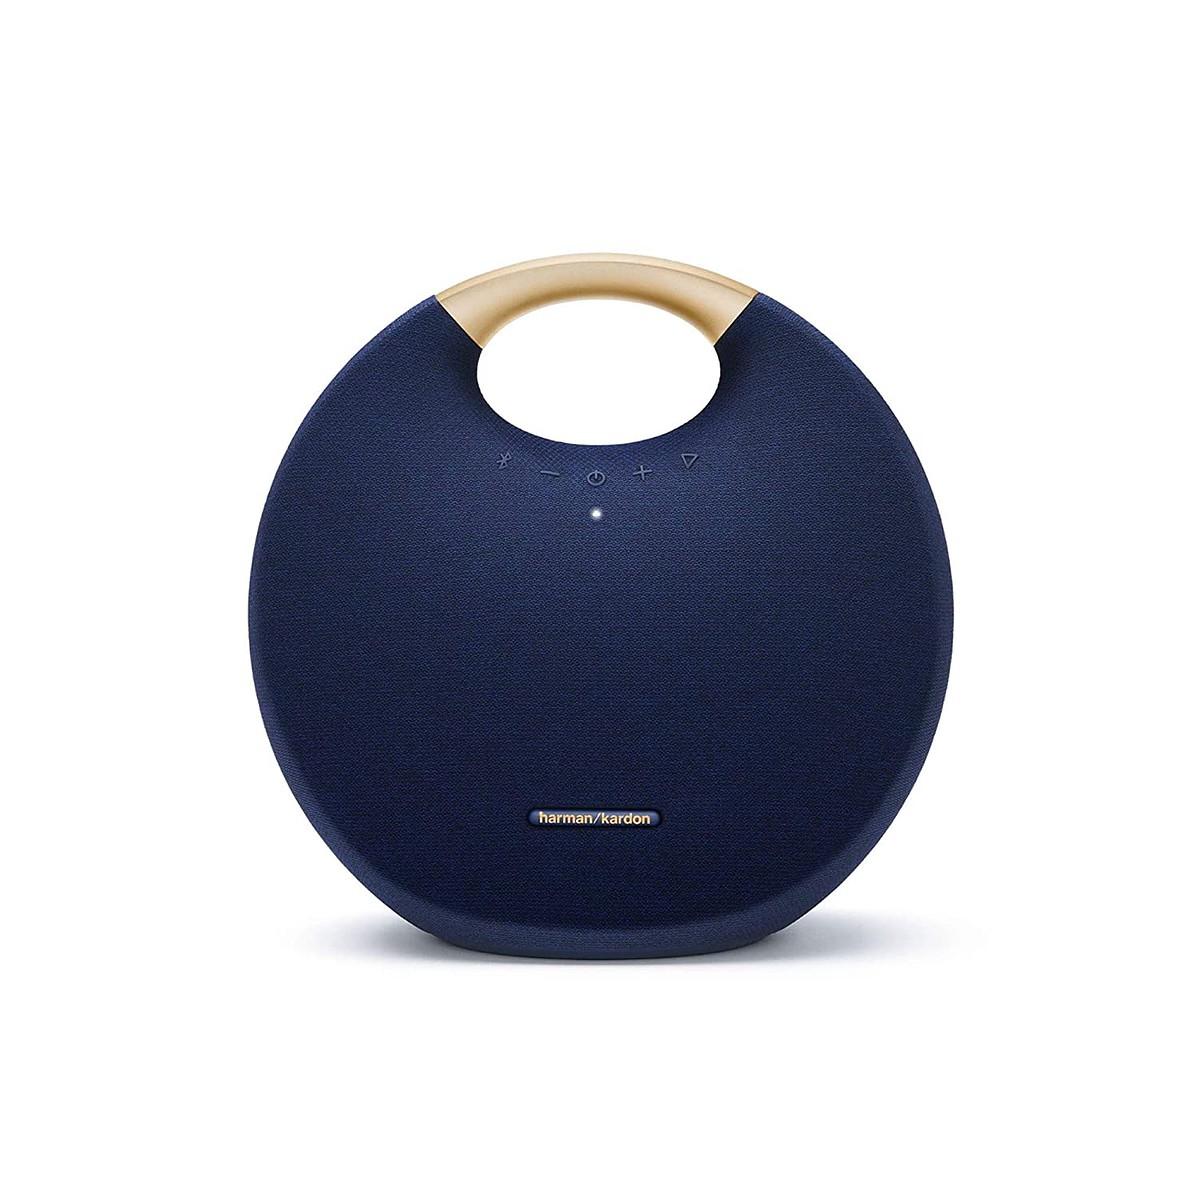 Harman Kardon Onyx Studio 6 Portable Wireless Speaker with IPX7 Waterproof - Blue